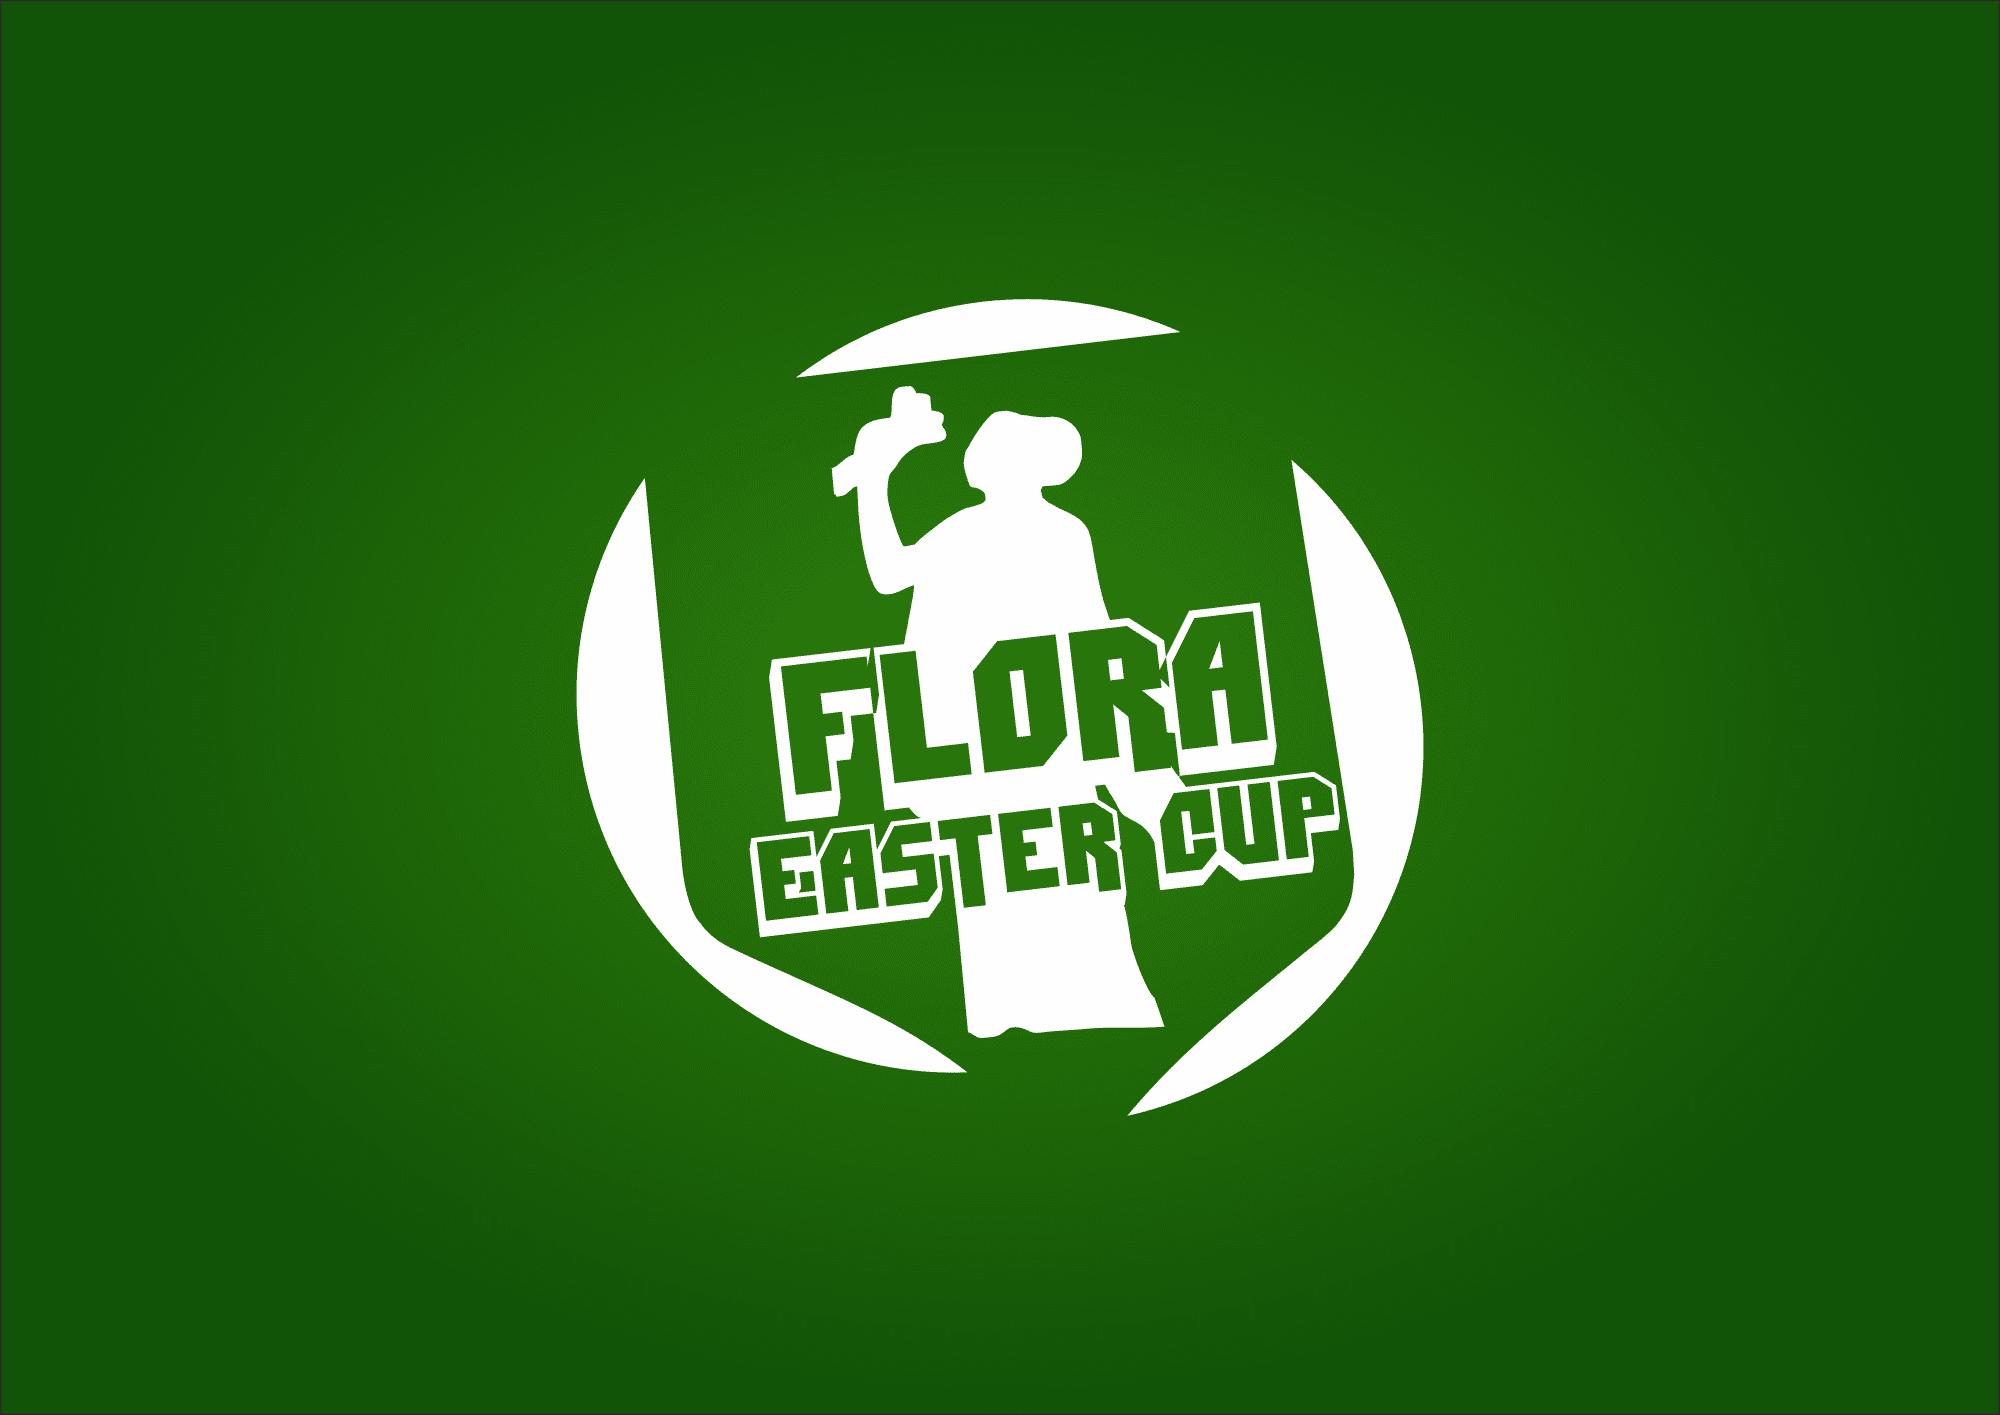 Easter Cup 2016 | TALLINN